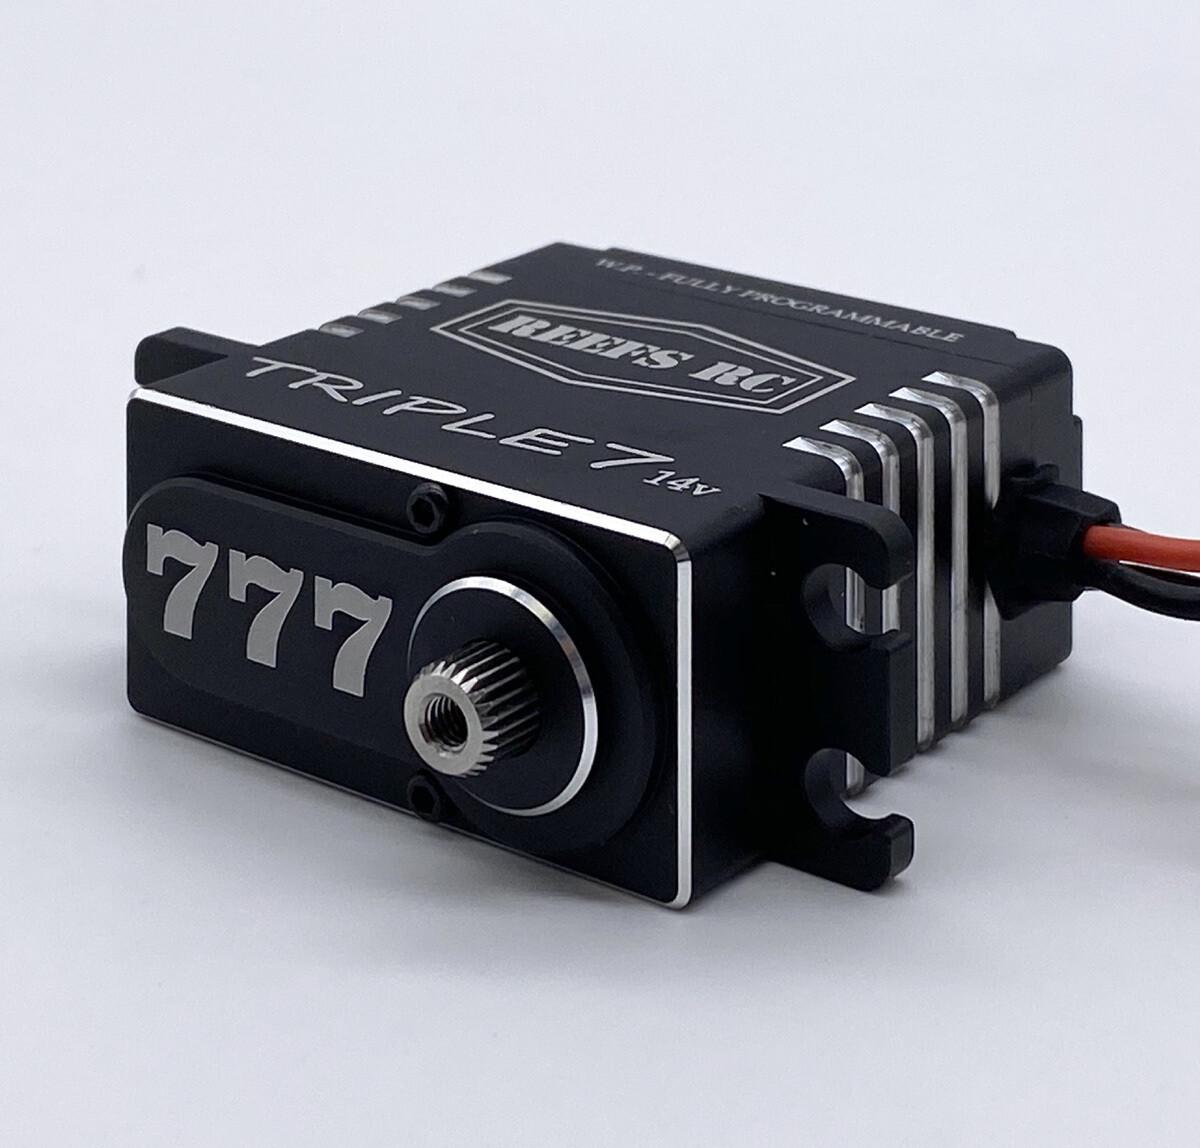 Reefs R/C Triple7 14V High Torque High Speed Brushless Programmable Servo SEHREEFS777